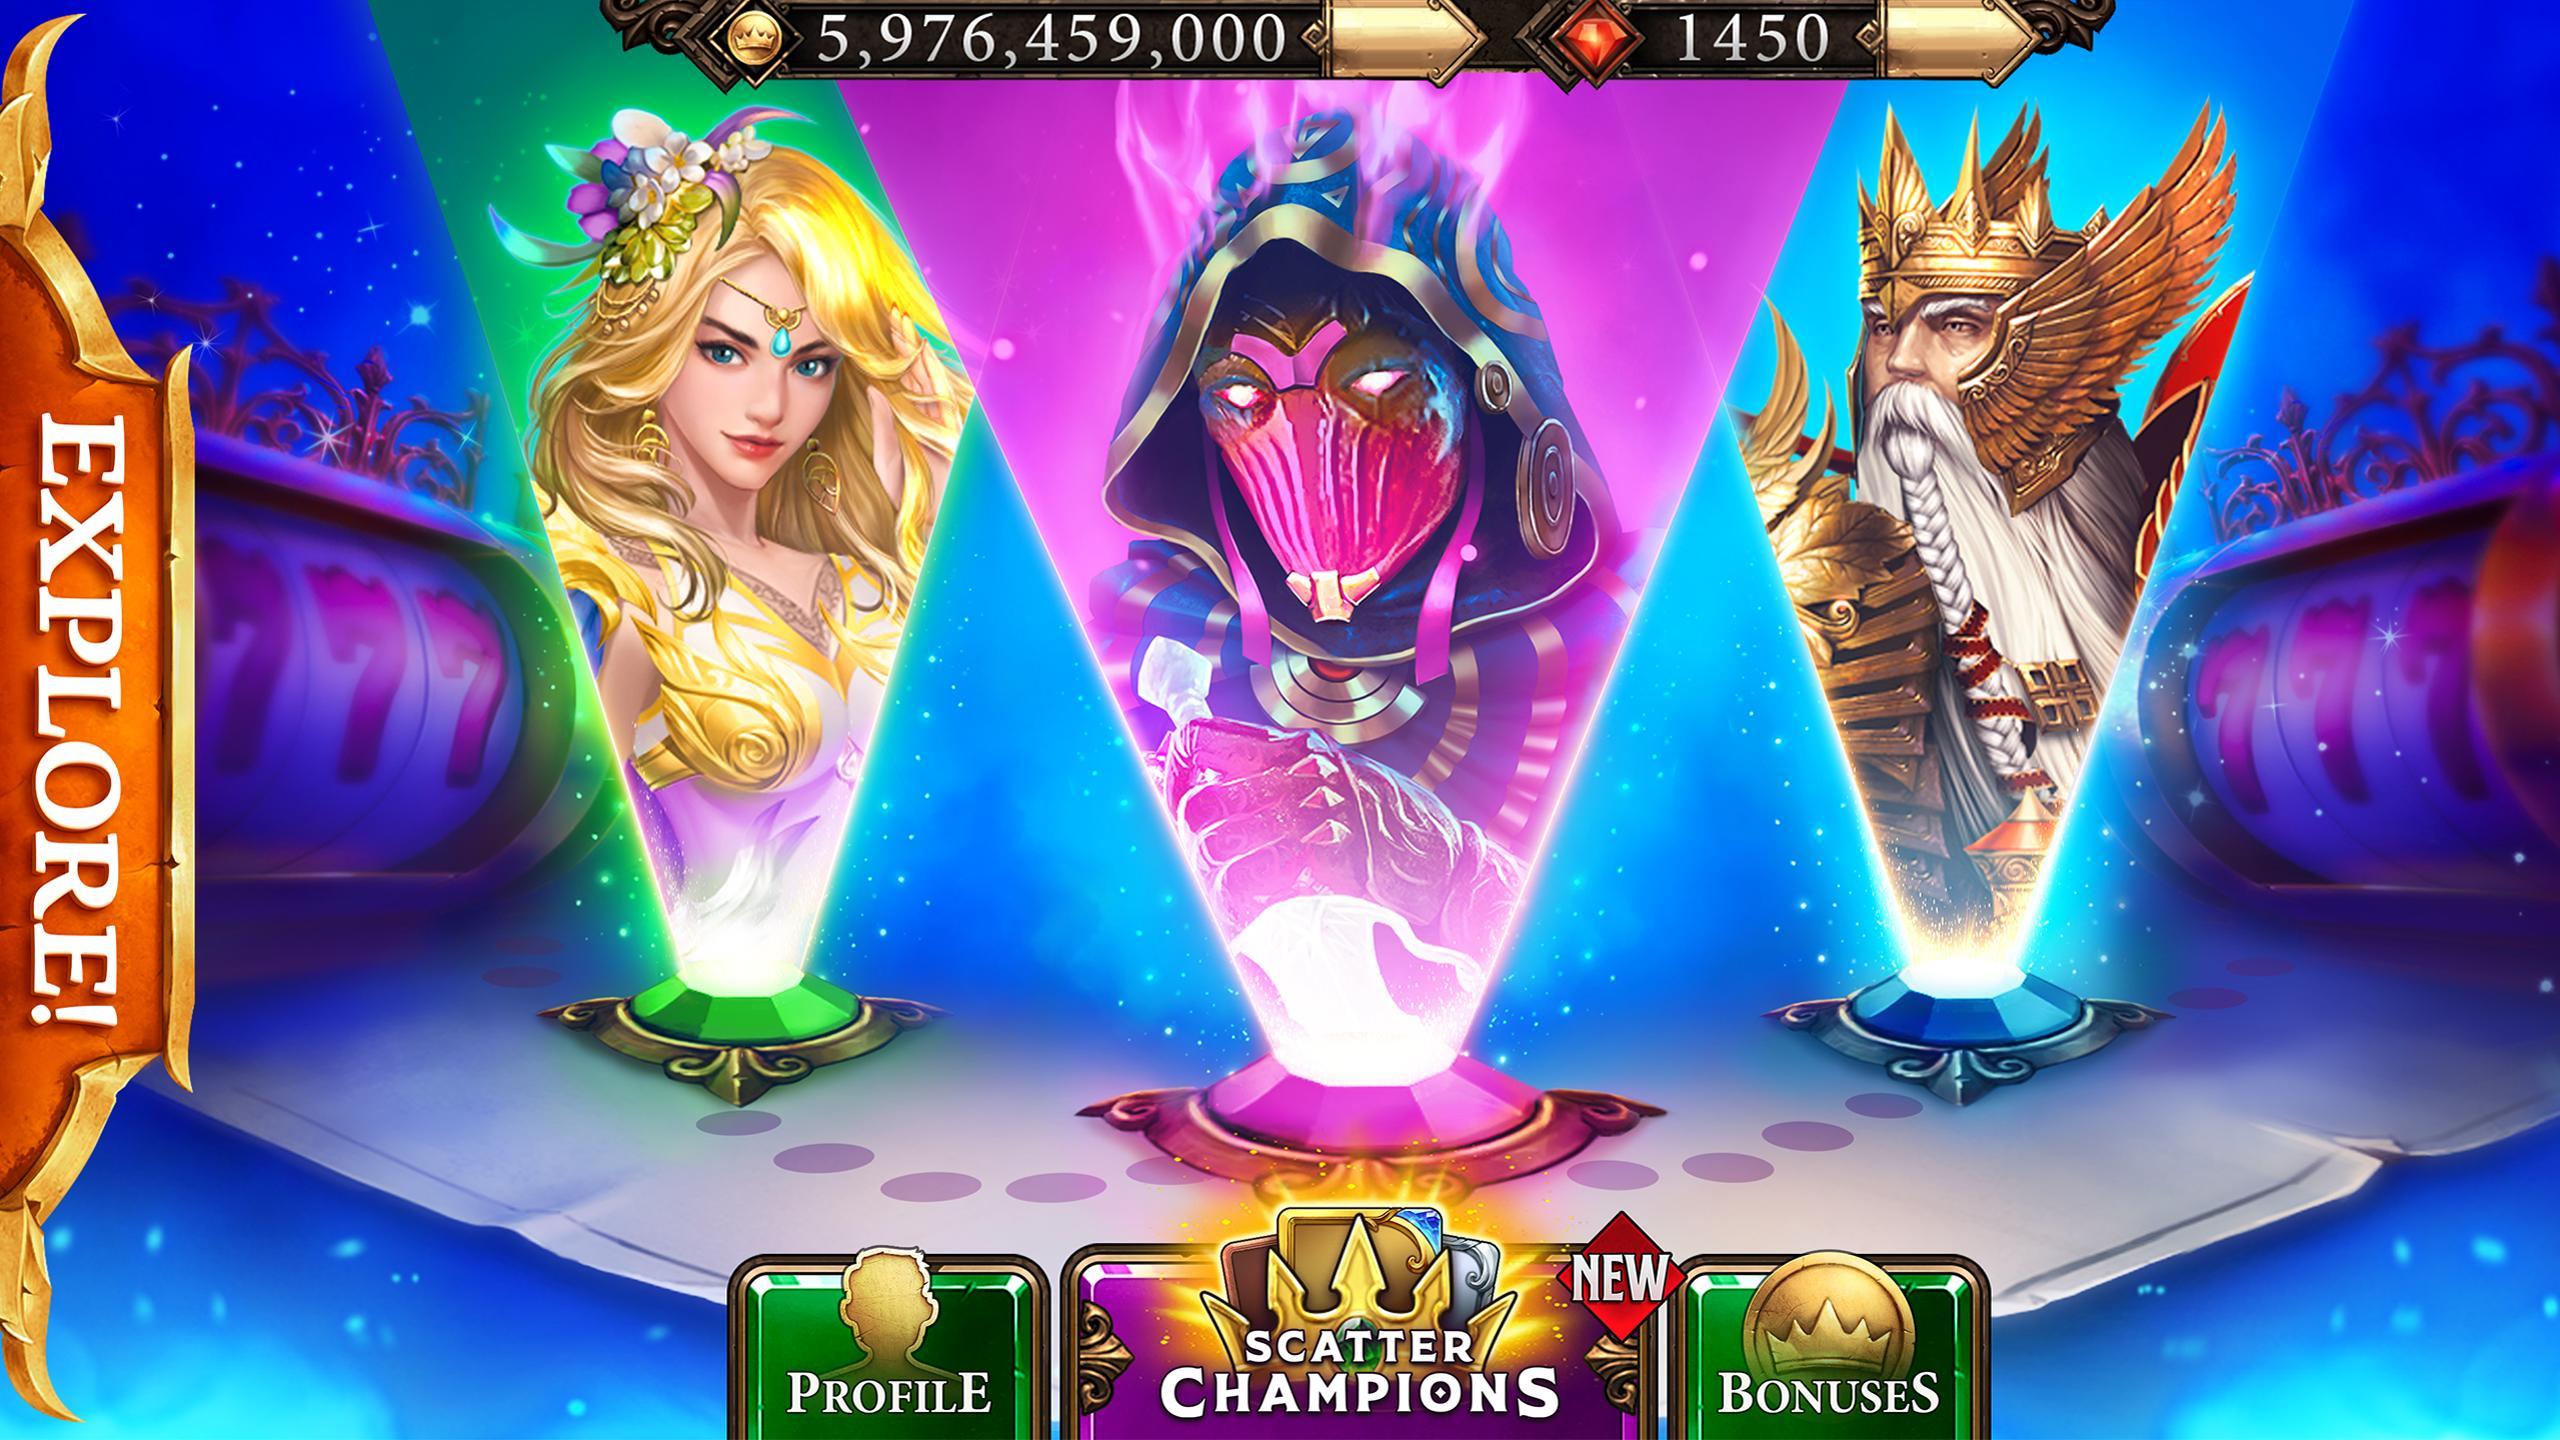 Scatter Slots Las Vegas Casino Game 777 Online 3.87.0 Screenshot 4